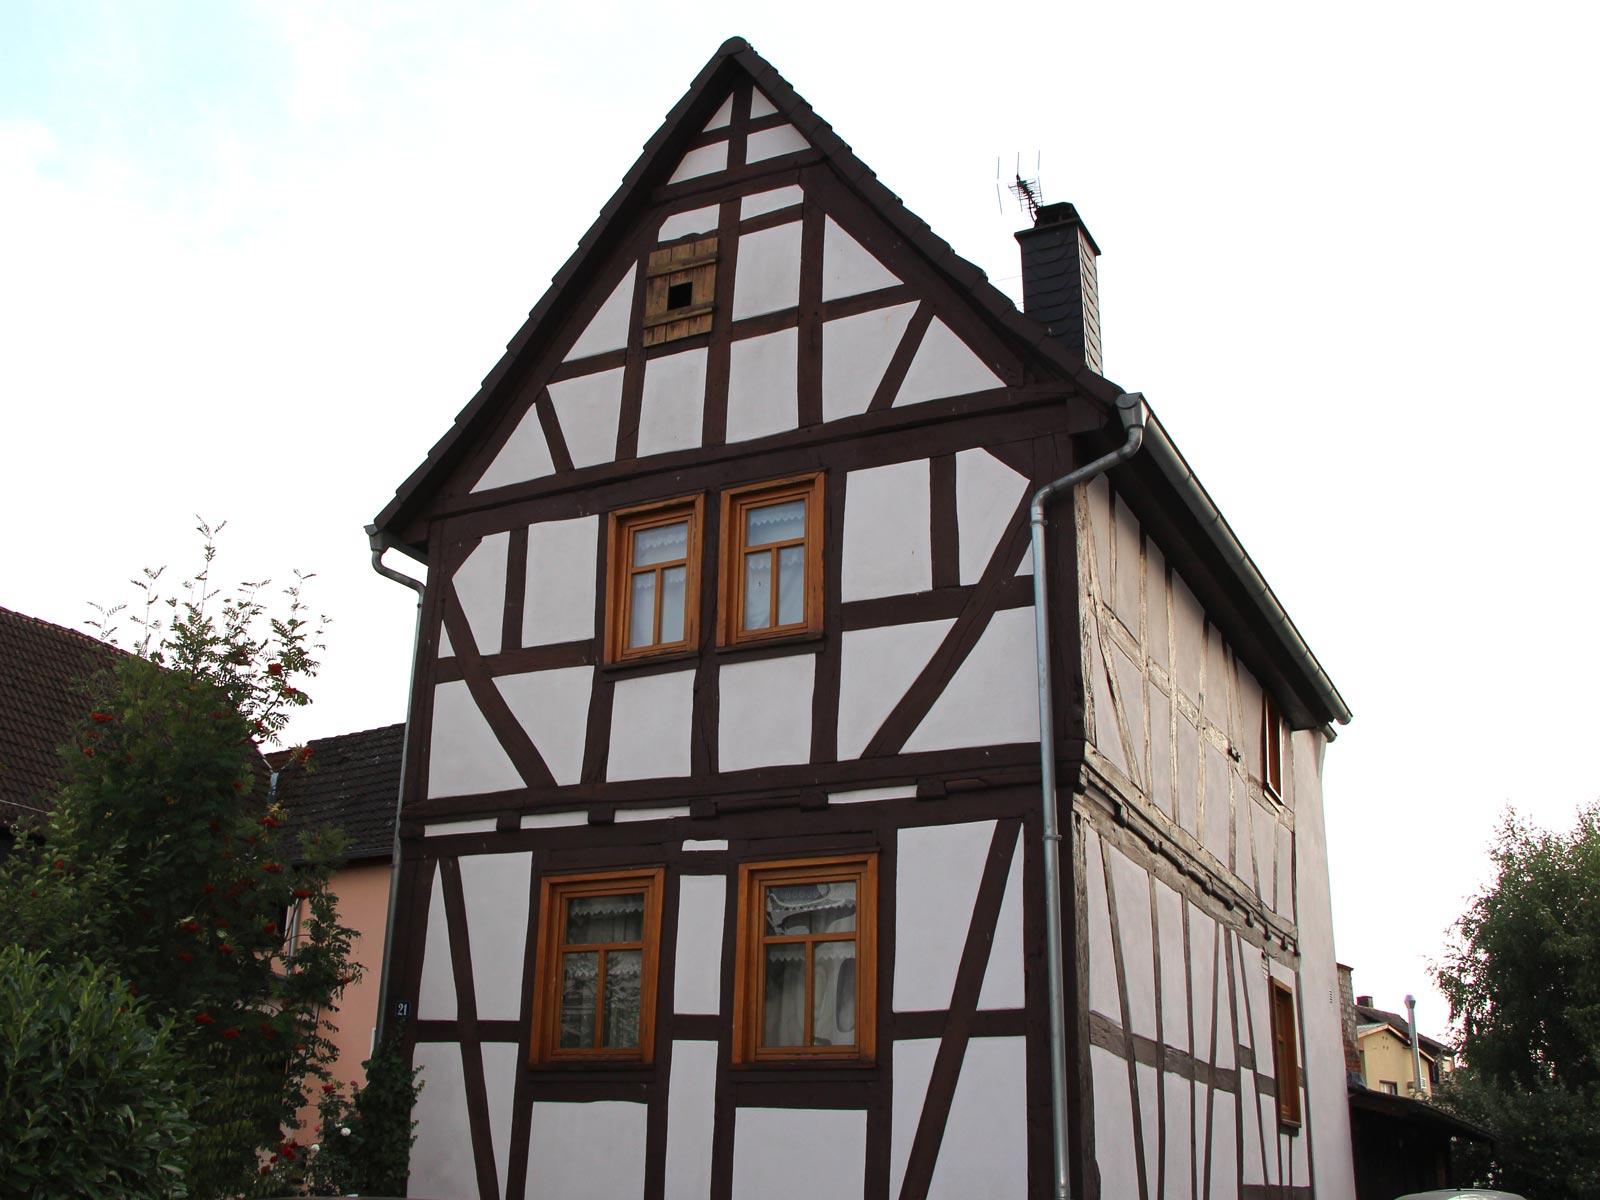 Denkmalgeschütztes Fachwerkhaus, Hauptstraße 21, Gonterskirchen, Kulturdenkmäler Laubach